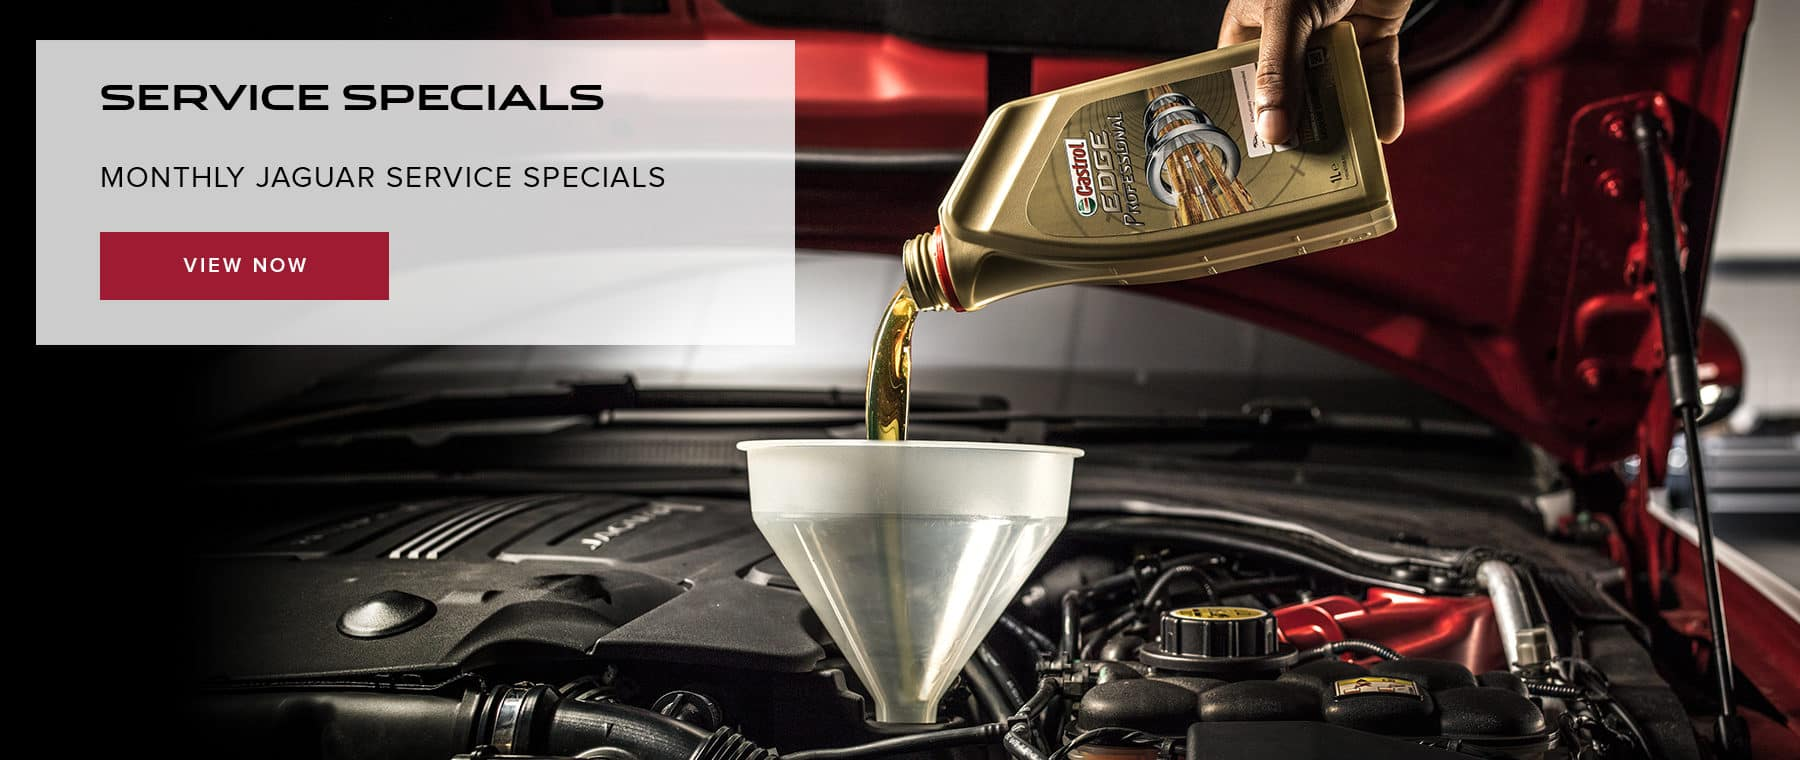 ServiceSpecials-1800×760